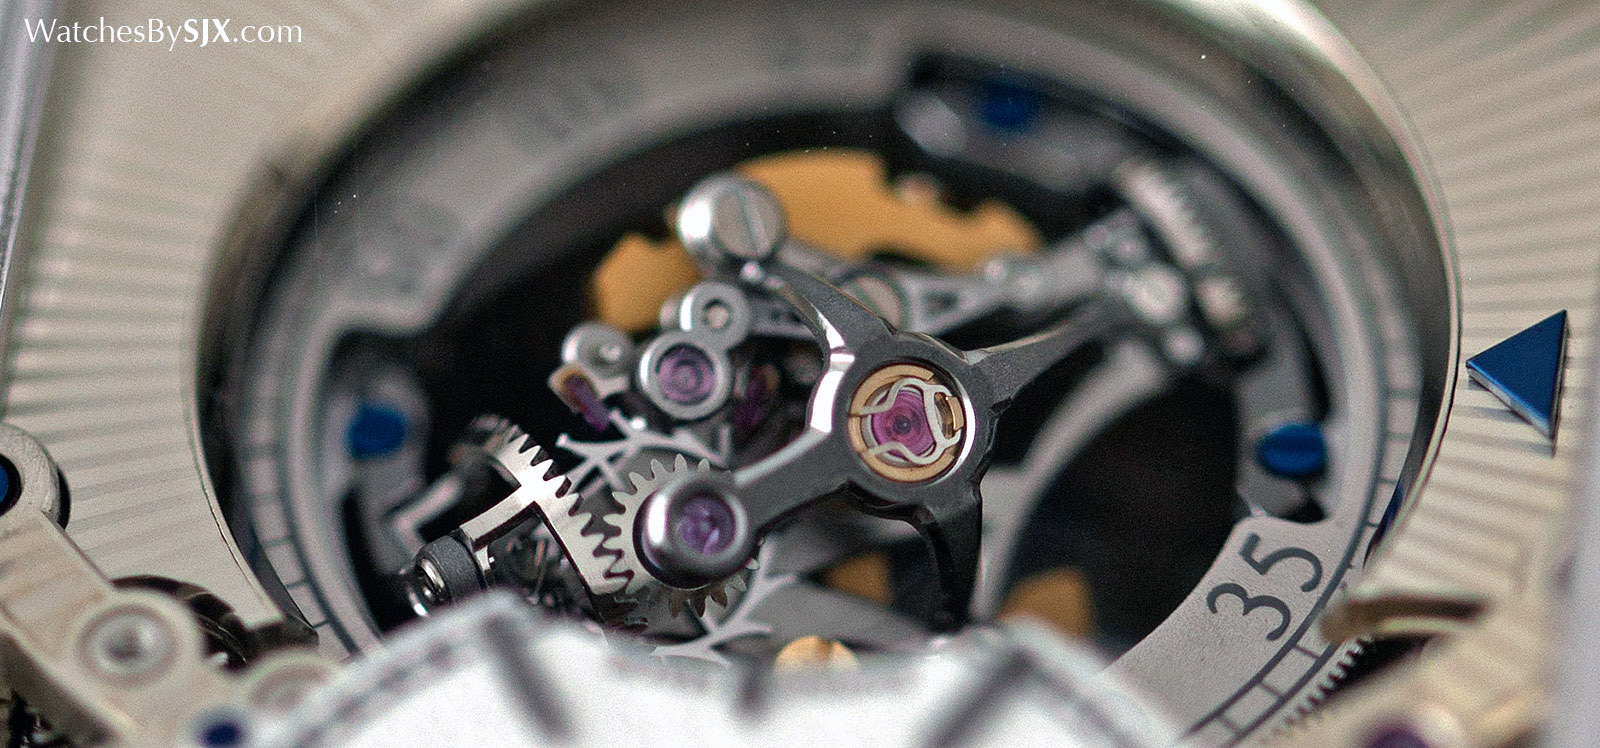 Jaeger-LeCoultre Reverso Tribute Gyrotourbillon platinum 13